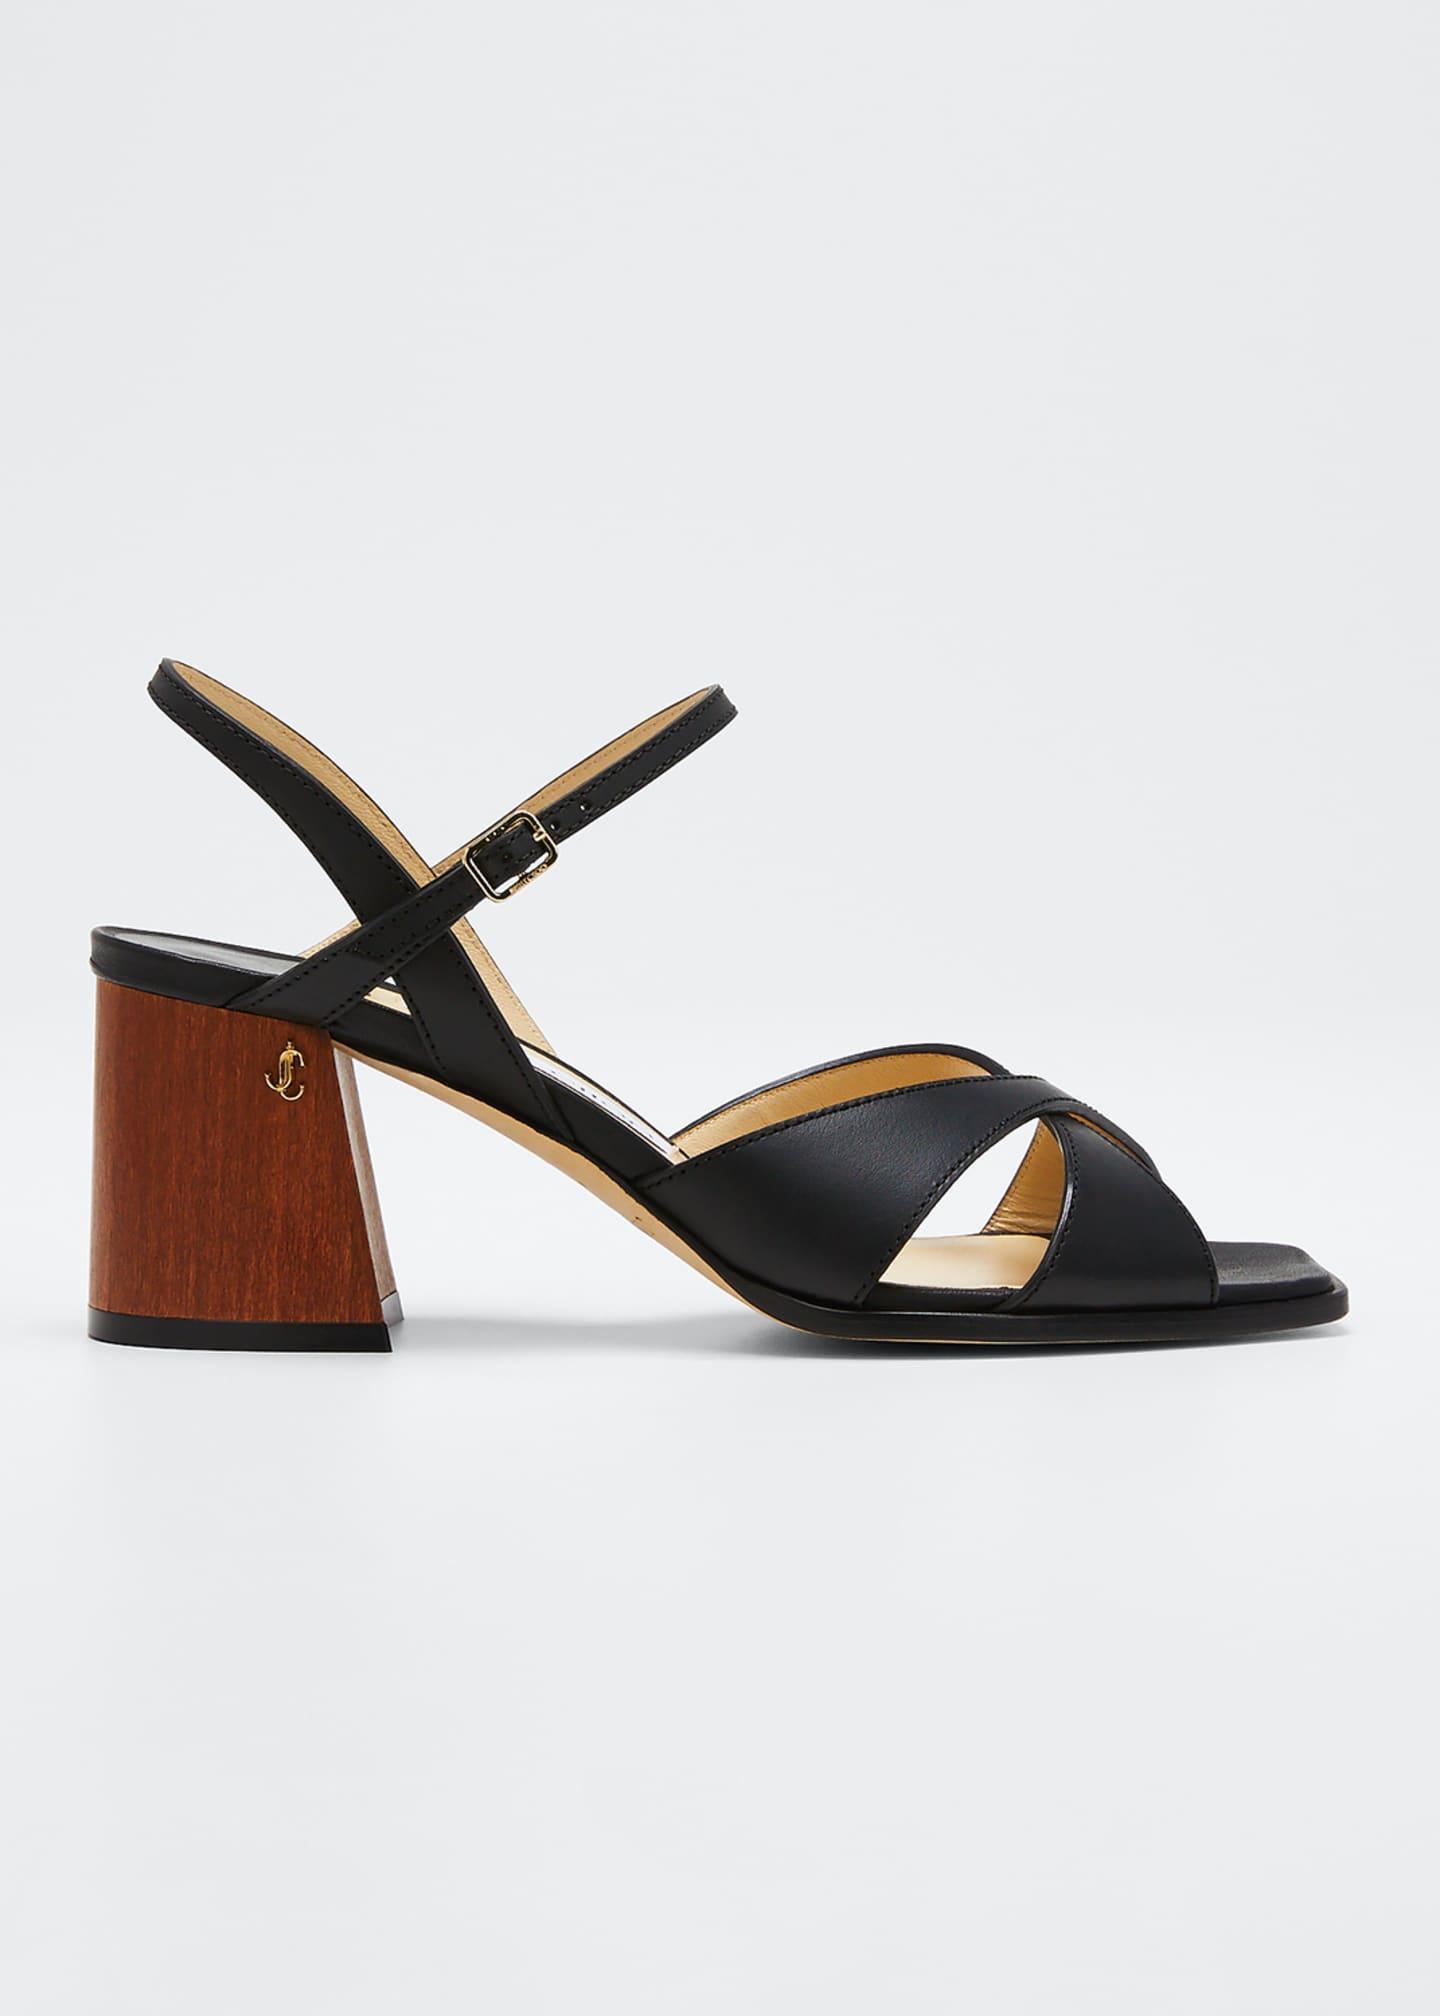 Jimmy Choo Joya 65mm Leather Sandals